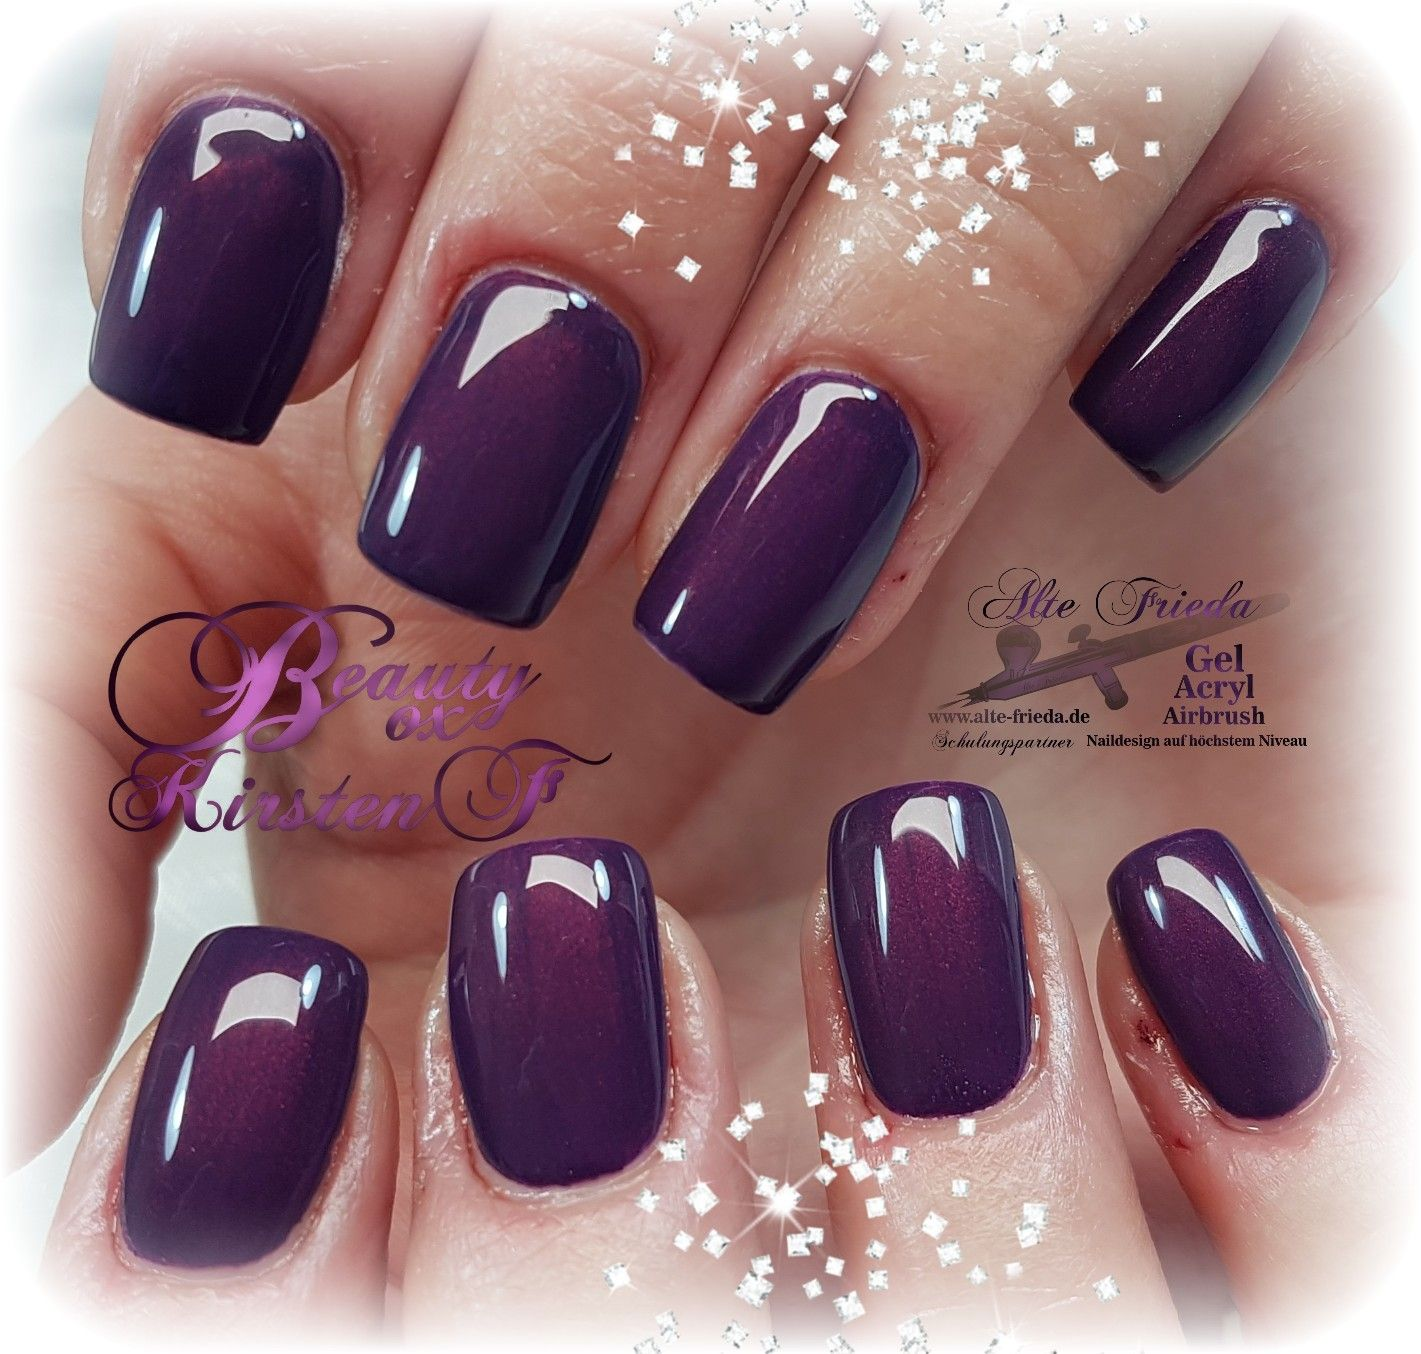 A F 075 Www Alte Frieda De Fullcover Nails Nagel Gelnagel Nail